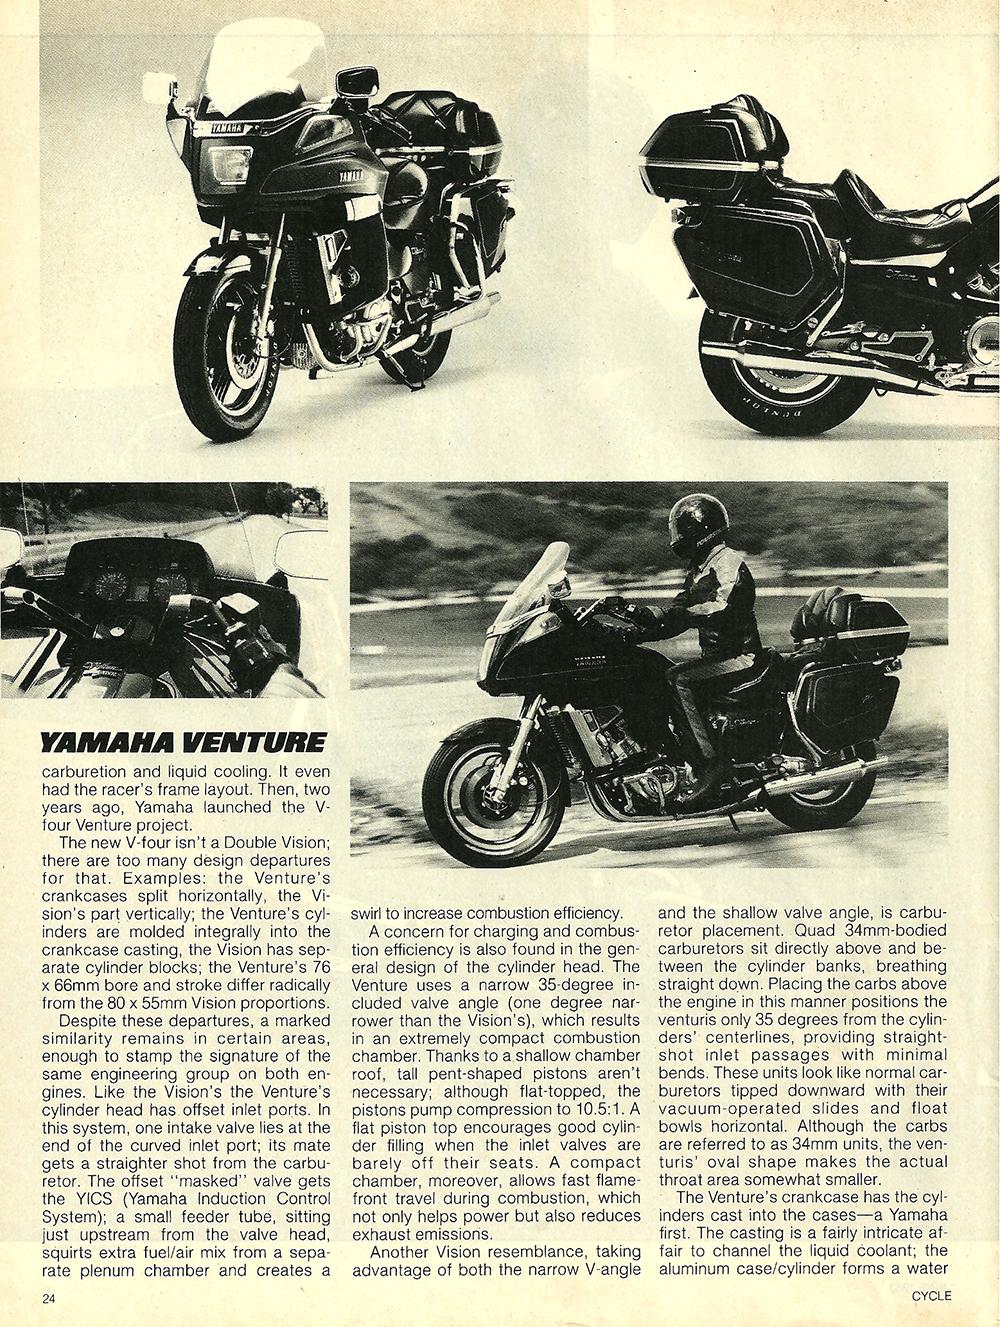 1983 Yamaha XVZ12TK Venture road test 03.jpg